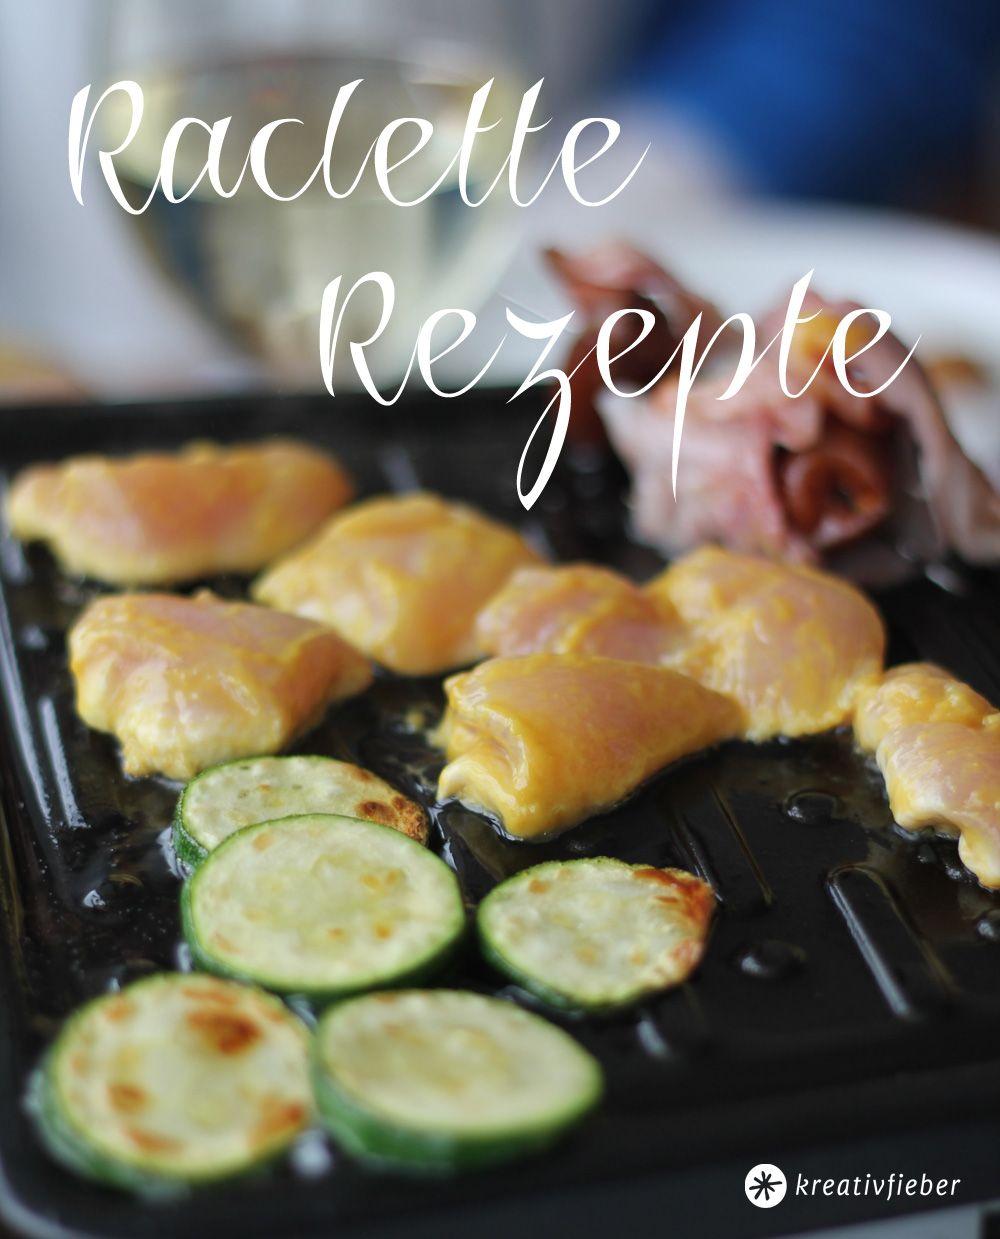 raclette rezepte mit fruchtsenf und chilisenf rezeptsammlung in 2018 raclette pinterest. Black Bedroom Furniture Sets. Home Design Ideas